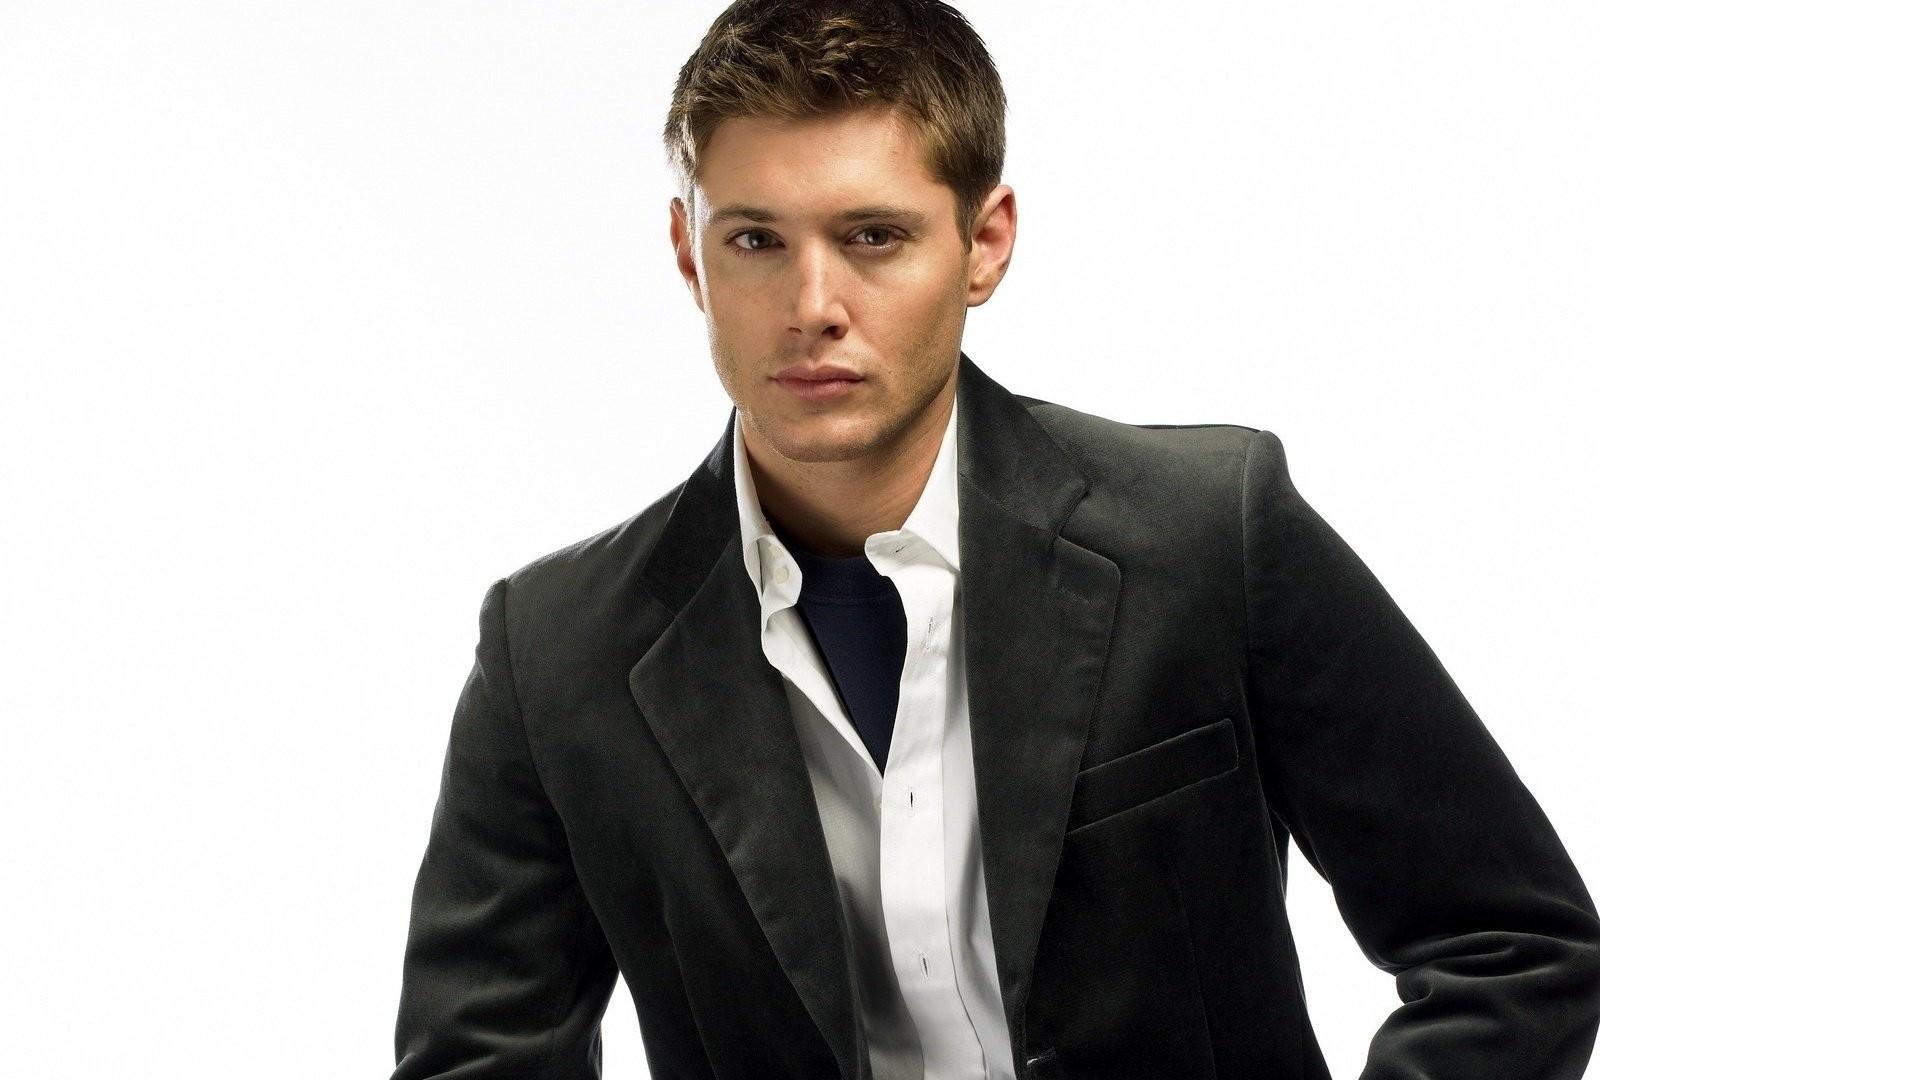 Jensen Ackles Wallpaper HD